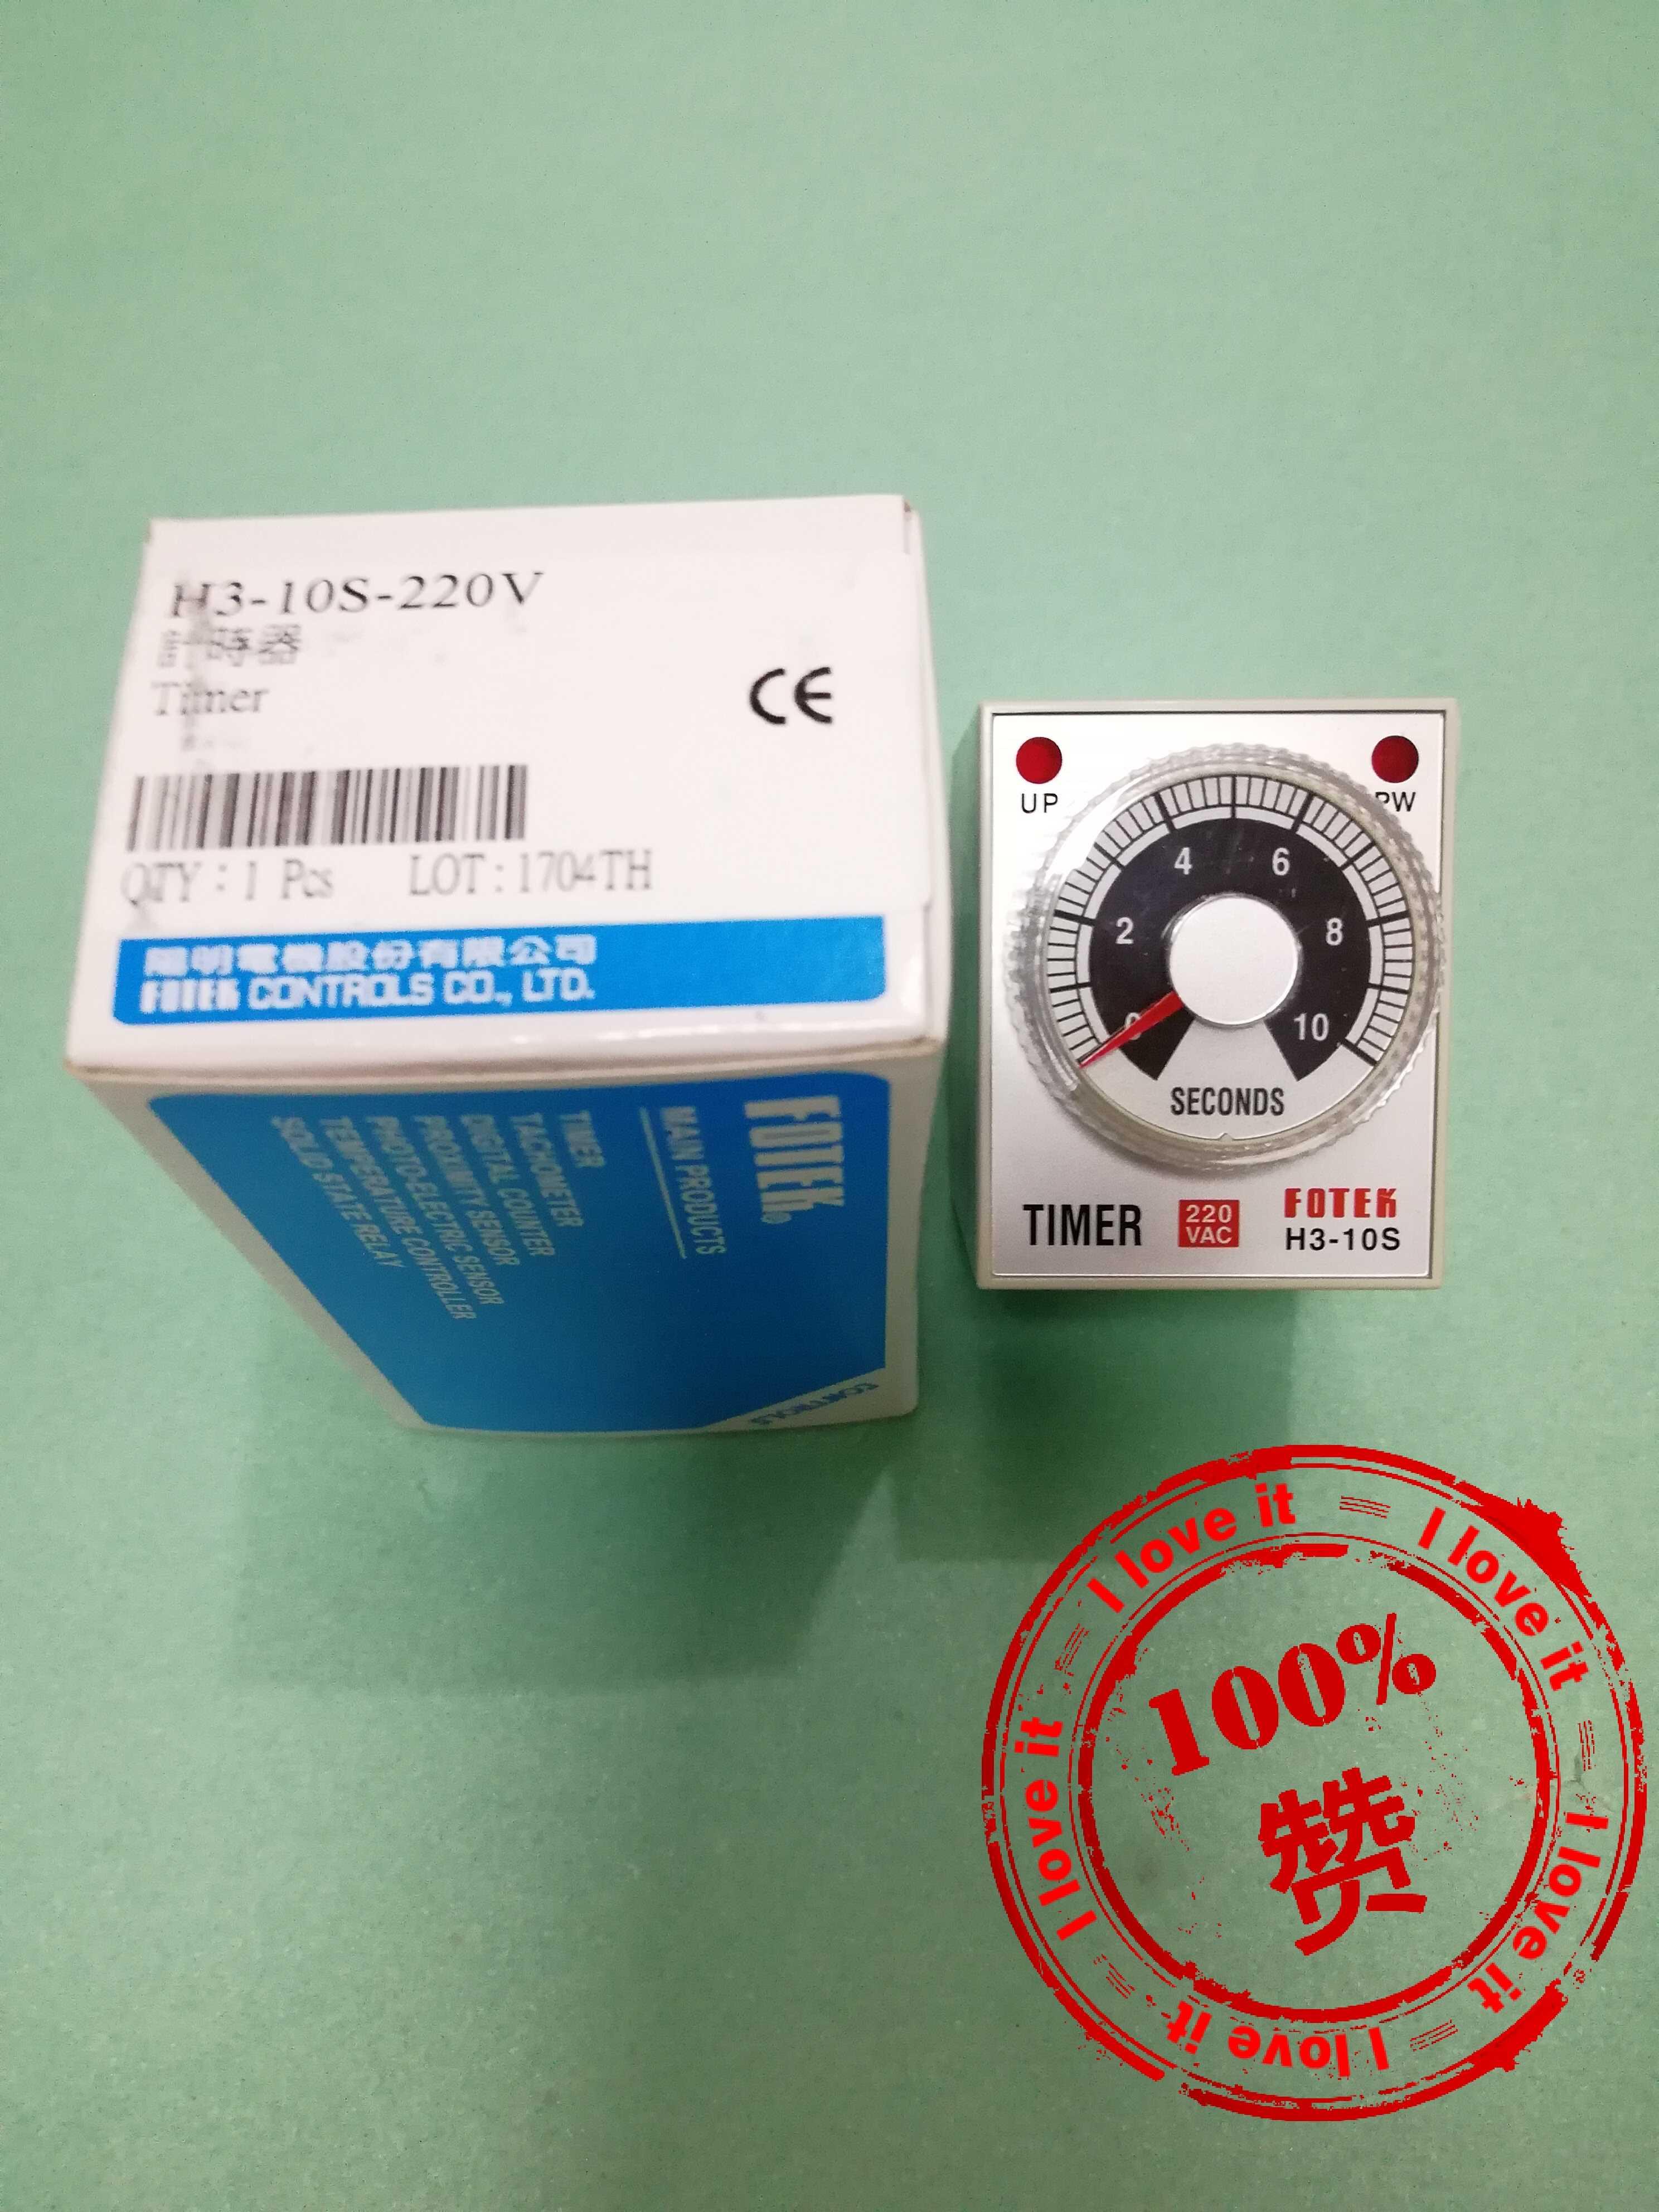 Original single-range delay timer H3-10S-220V false penalty 10Original single-range delay timer H3-10S-220V false penalty 10